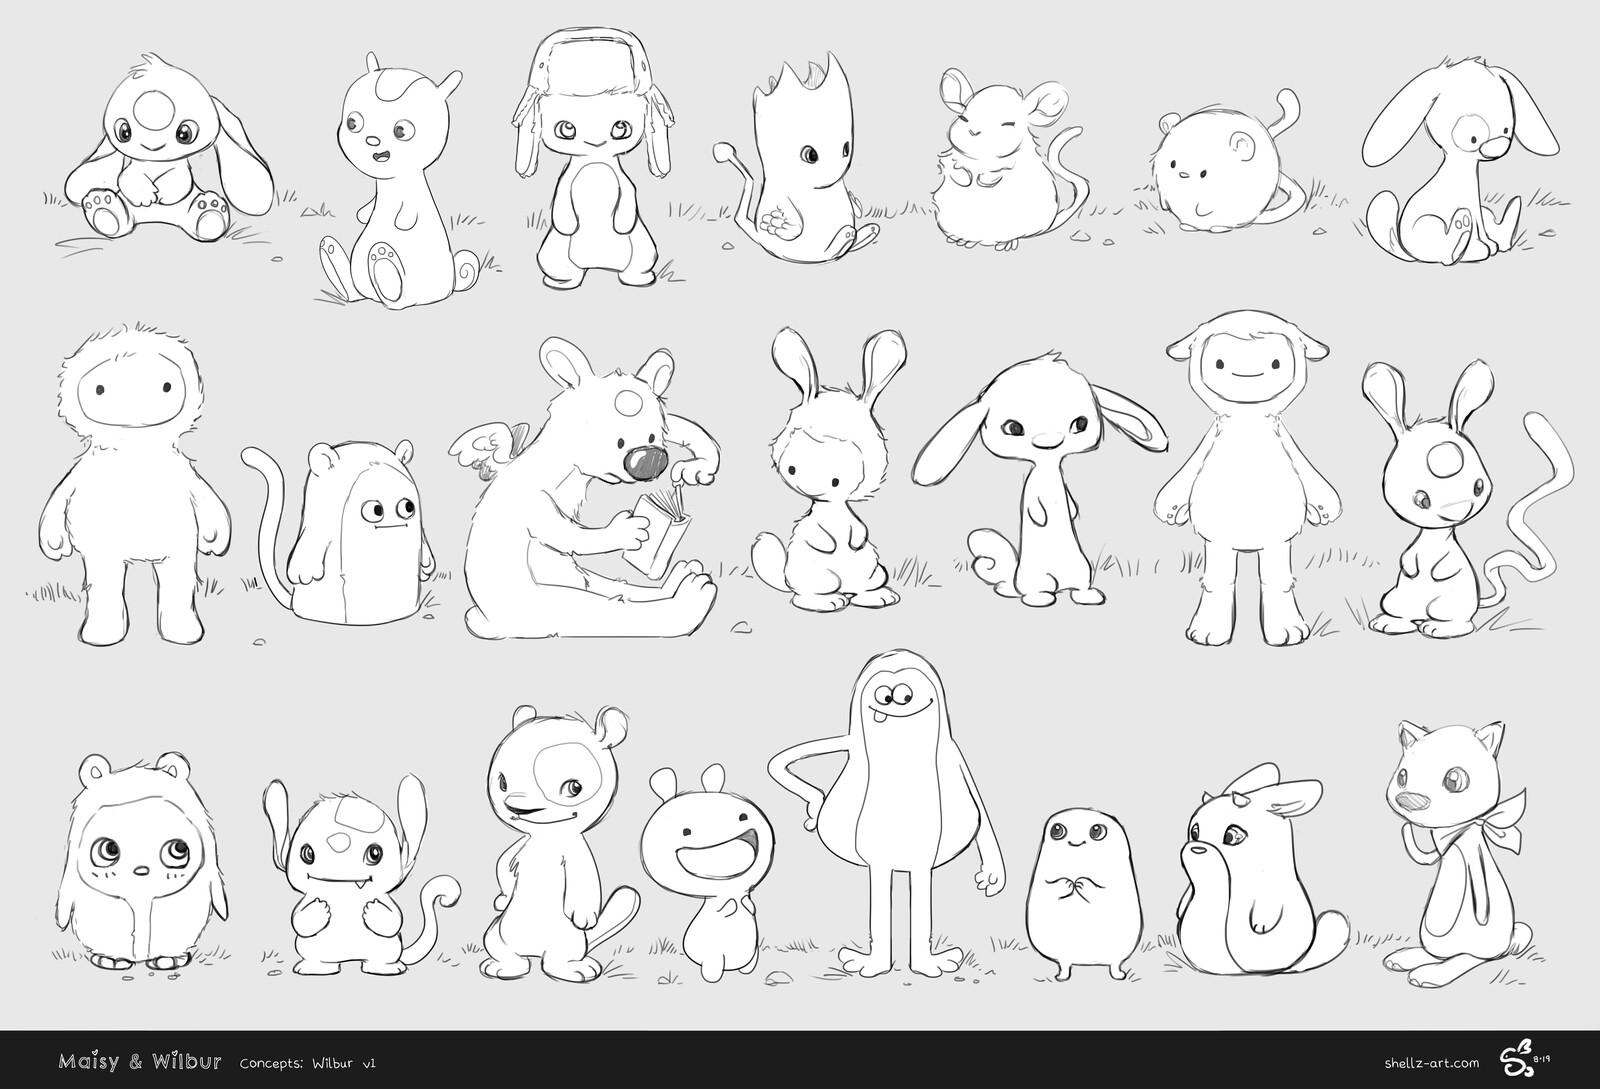 Maisy & Wilbur Concepts - Wilbur v1